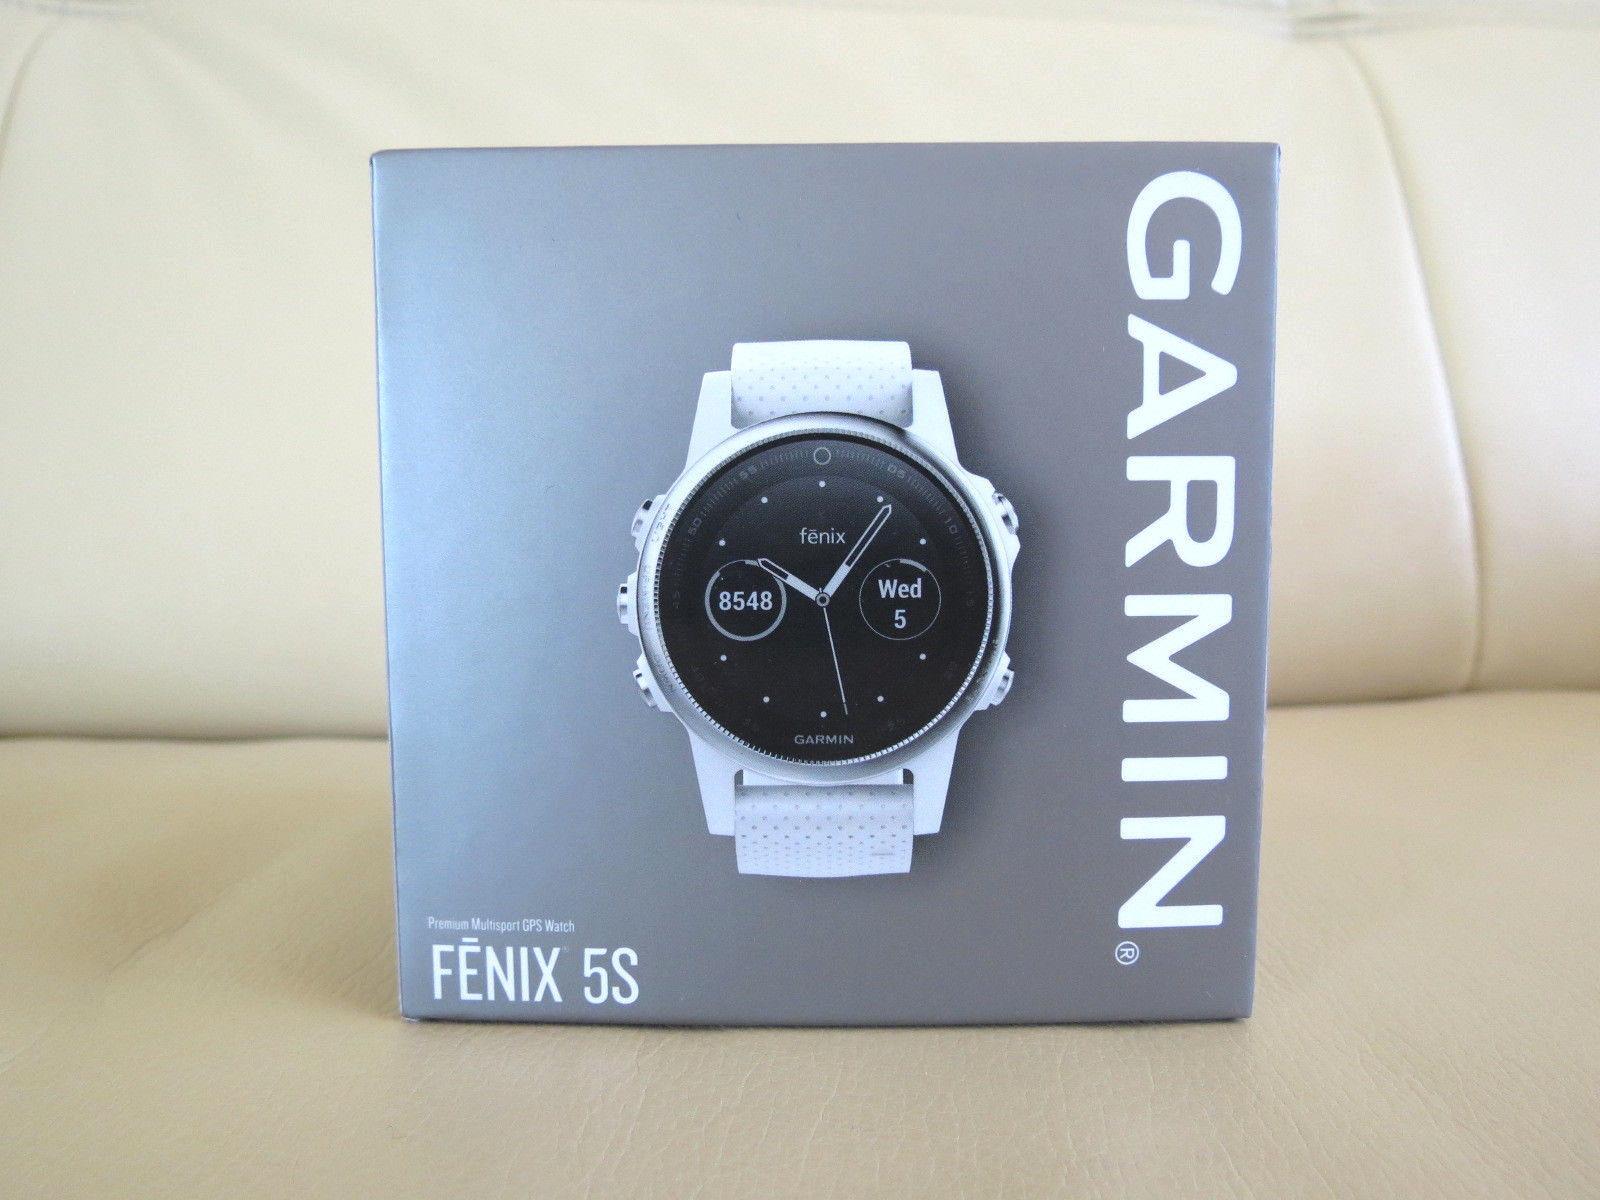 Neu Garmin Fenix 5S White Weiß Premium MultiSport GPS Watch - FREE SHIPPING !!!